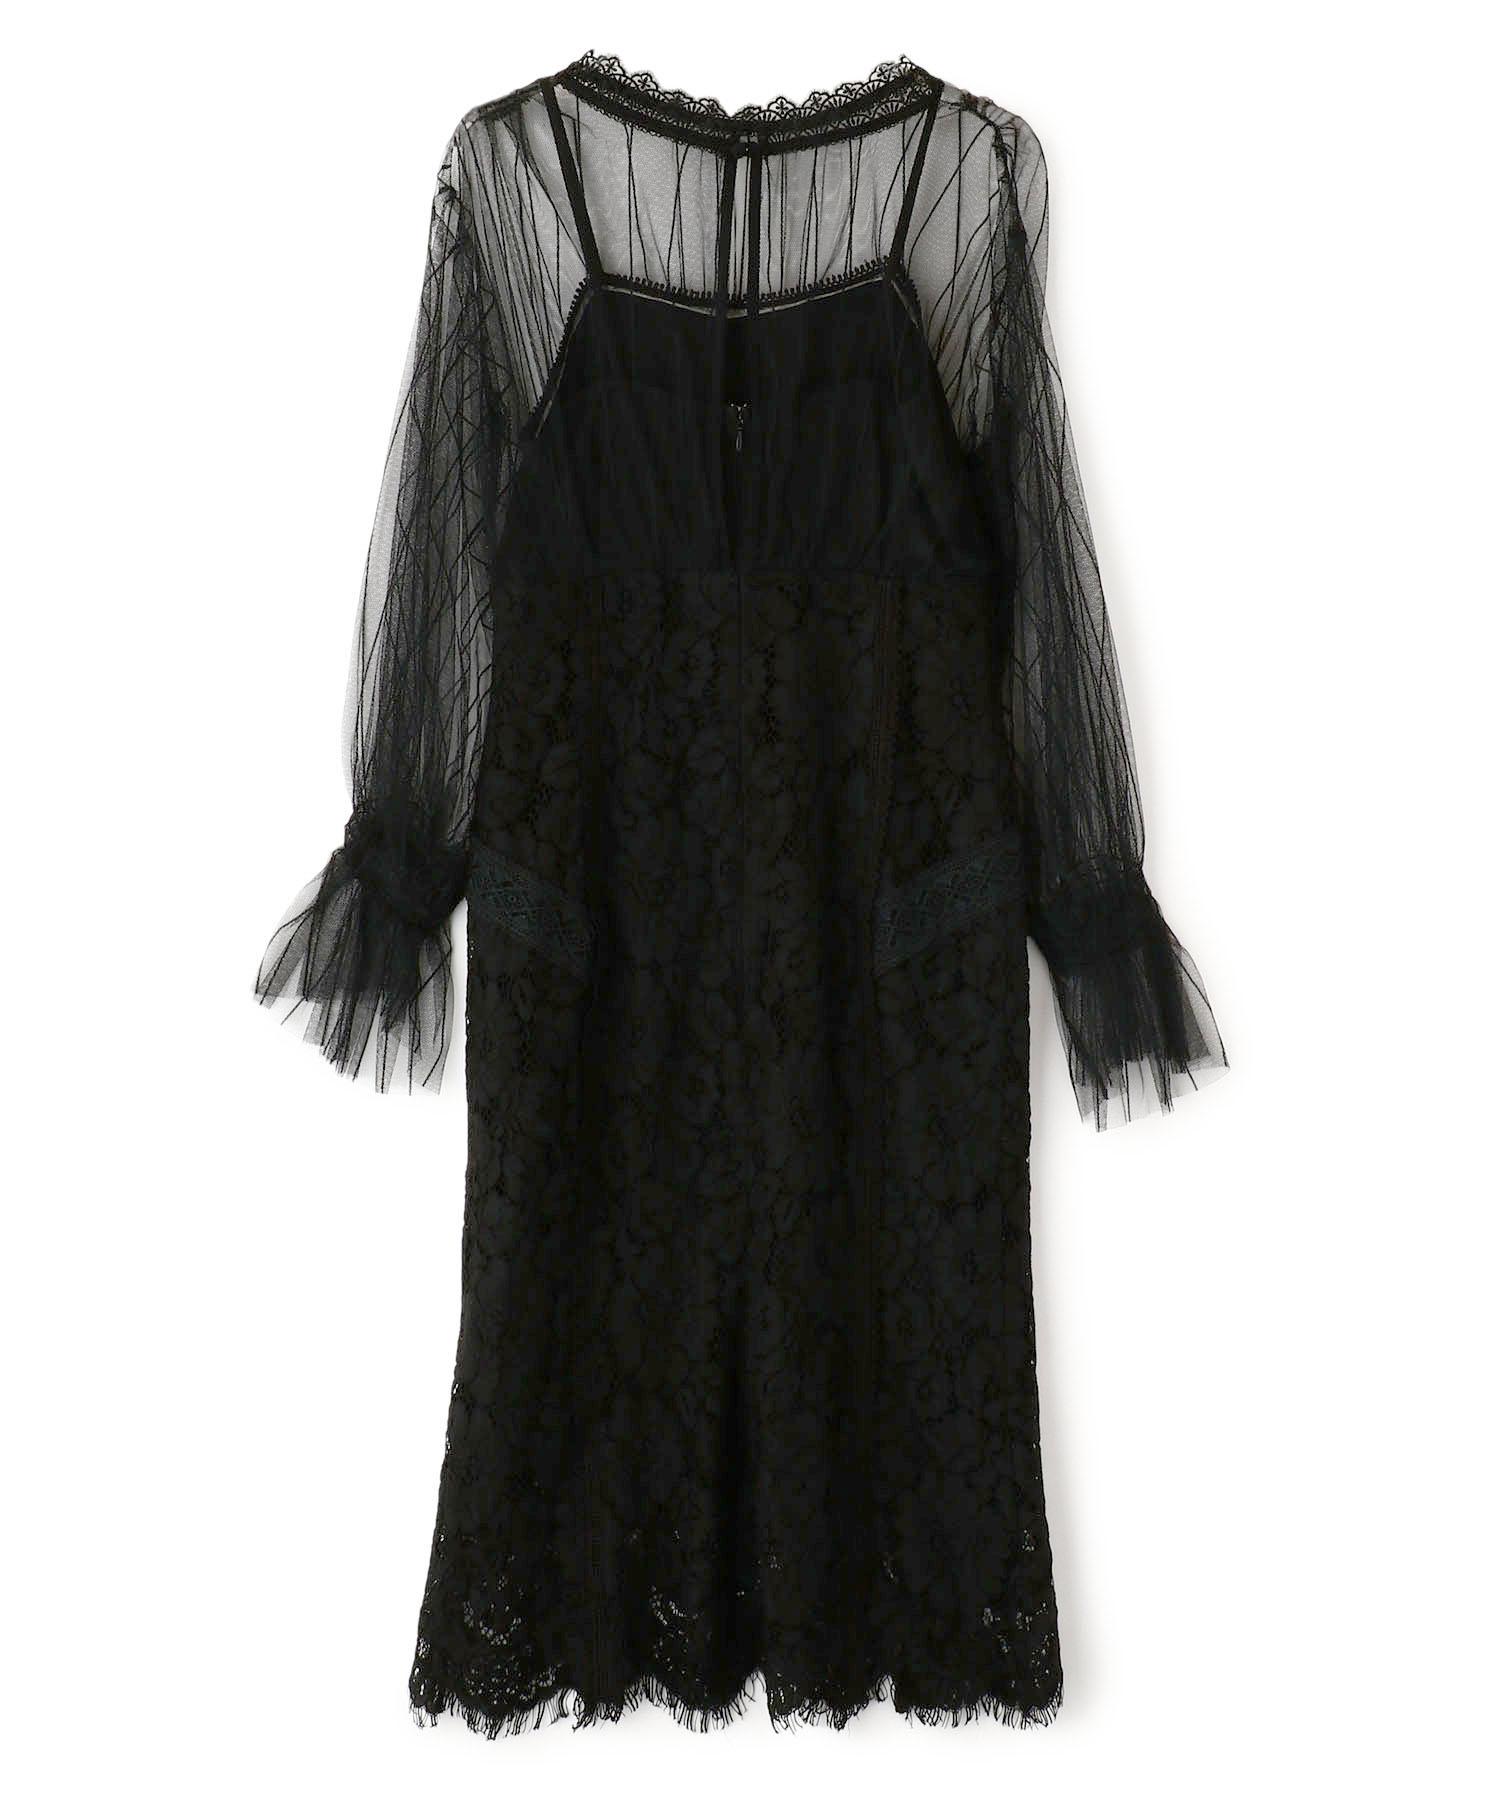 Stripe Tulle Lace Dress